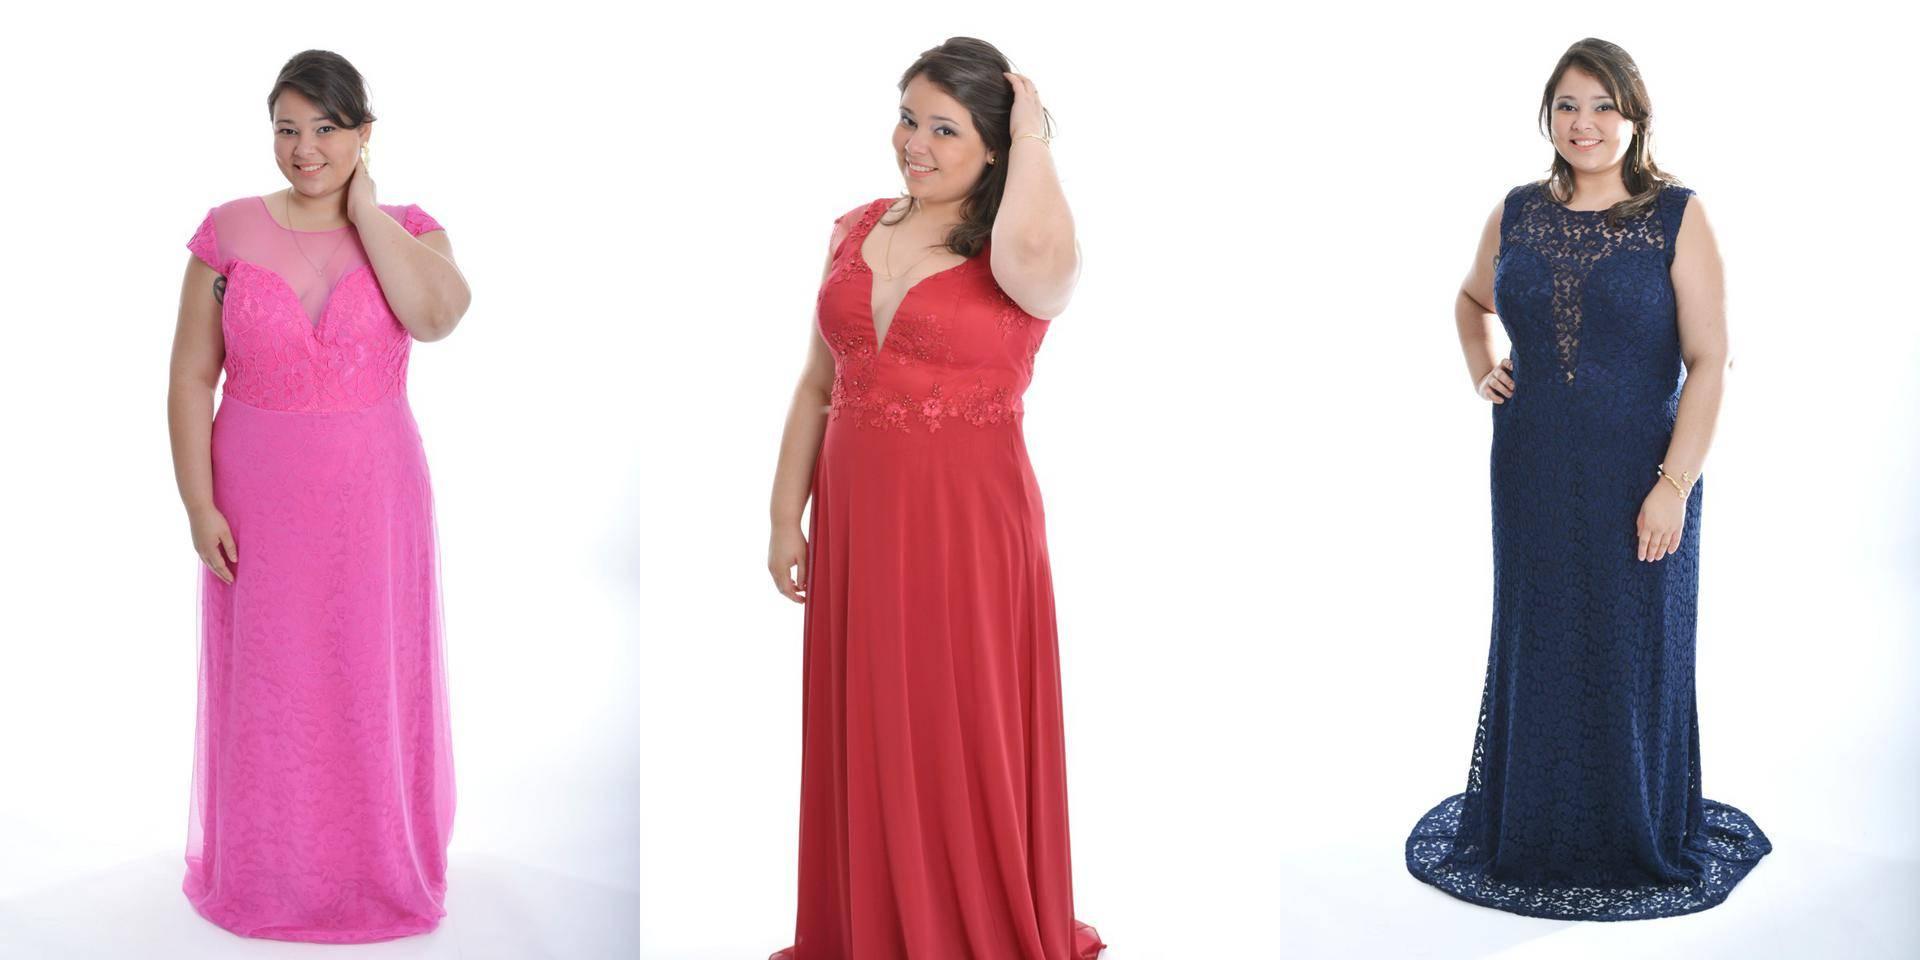 efbb4c127 Vestidos de festa plus size em Santos: tem na Ágape 7 - Juicy Santos